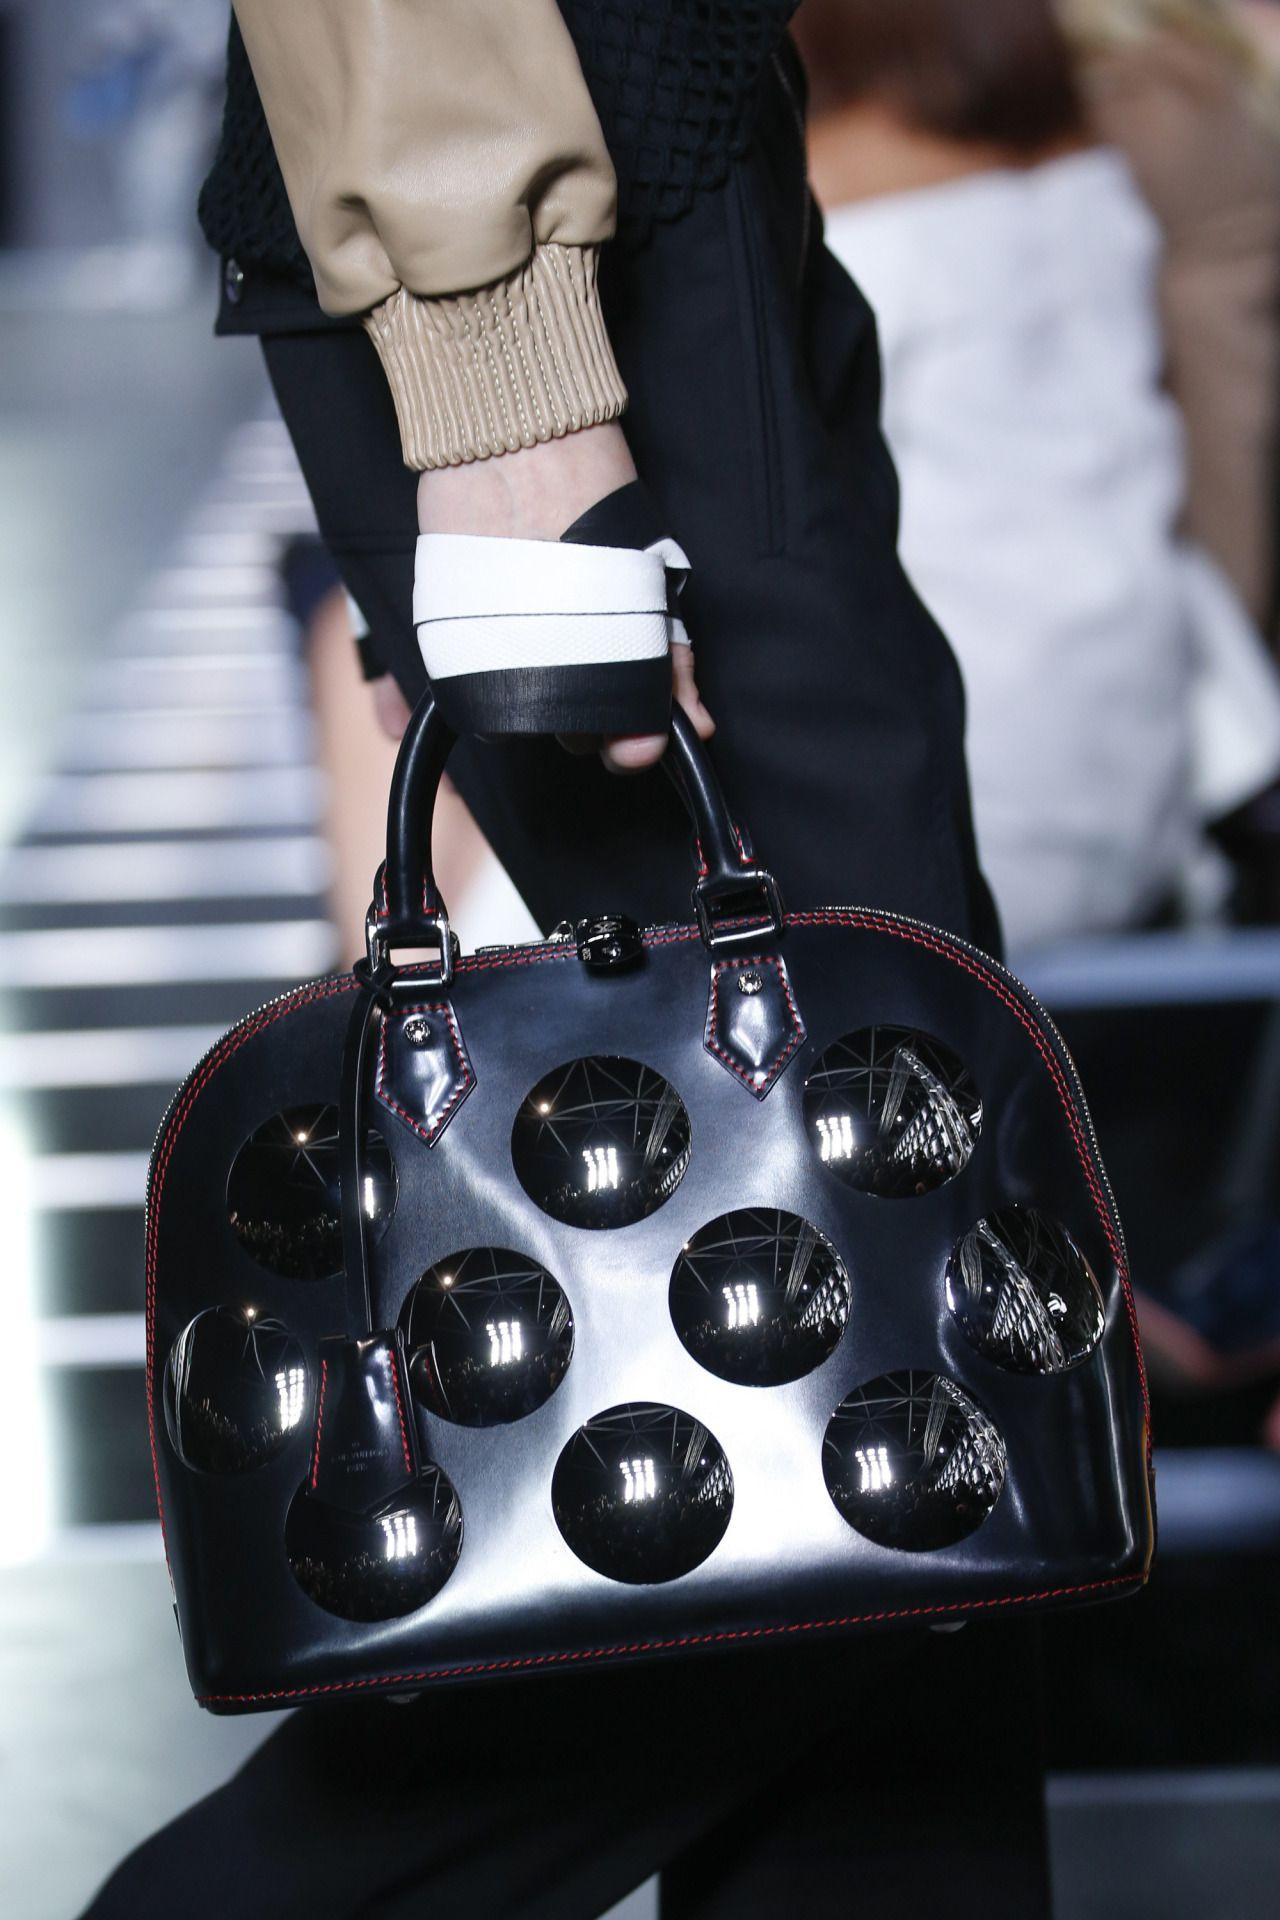 Louis Vuitton - Paris Fashion Week / Spring Summer... - welcome in the world of fashion